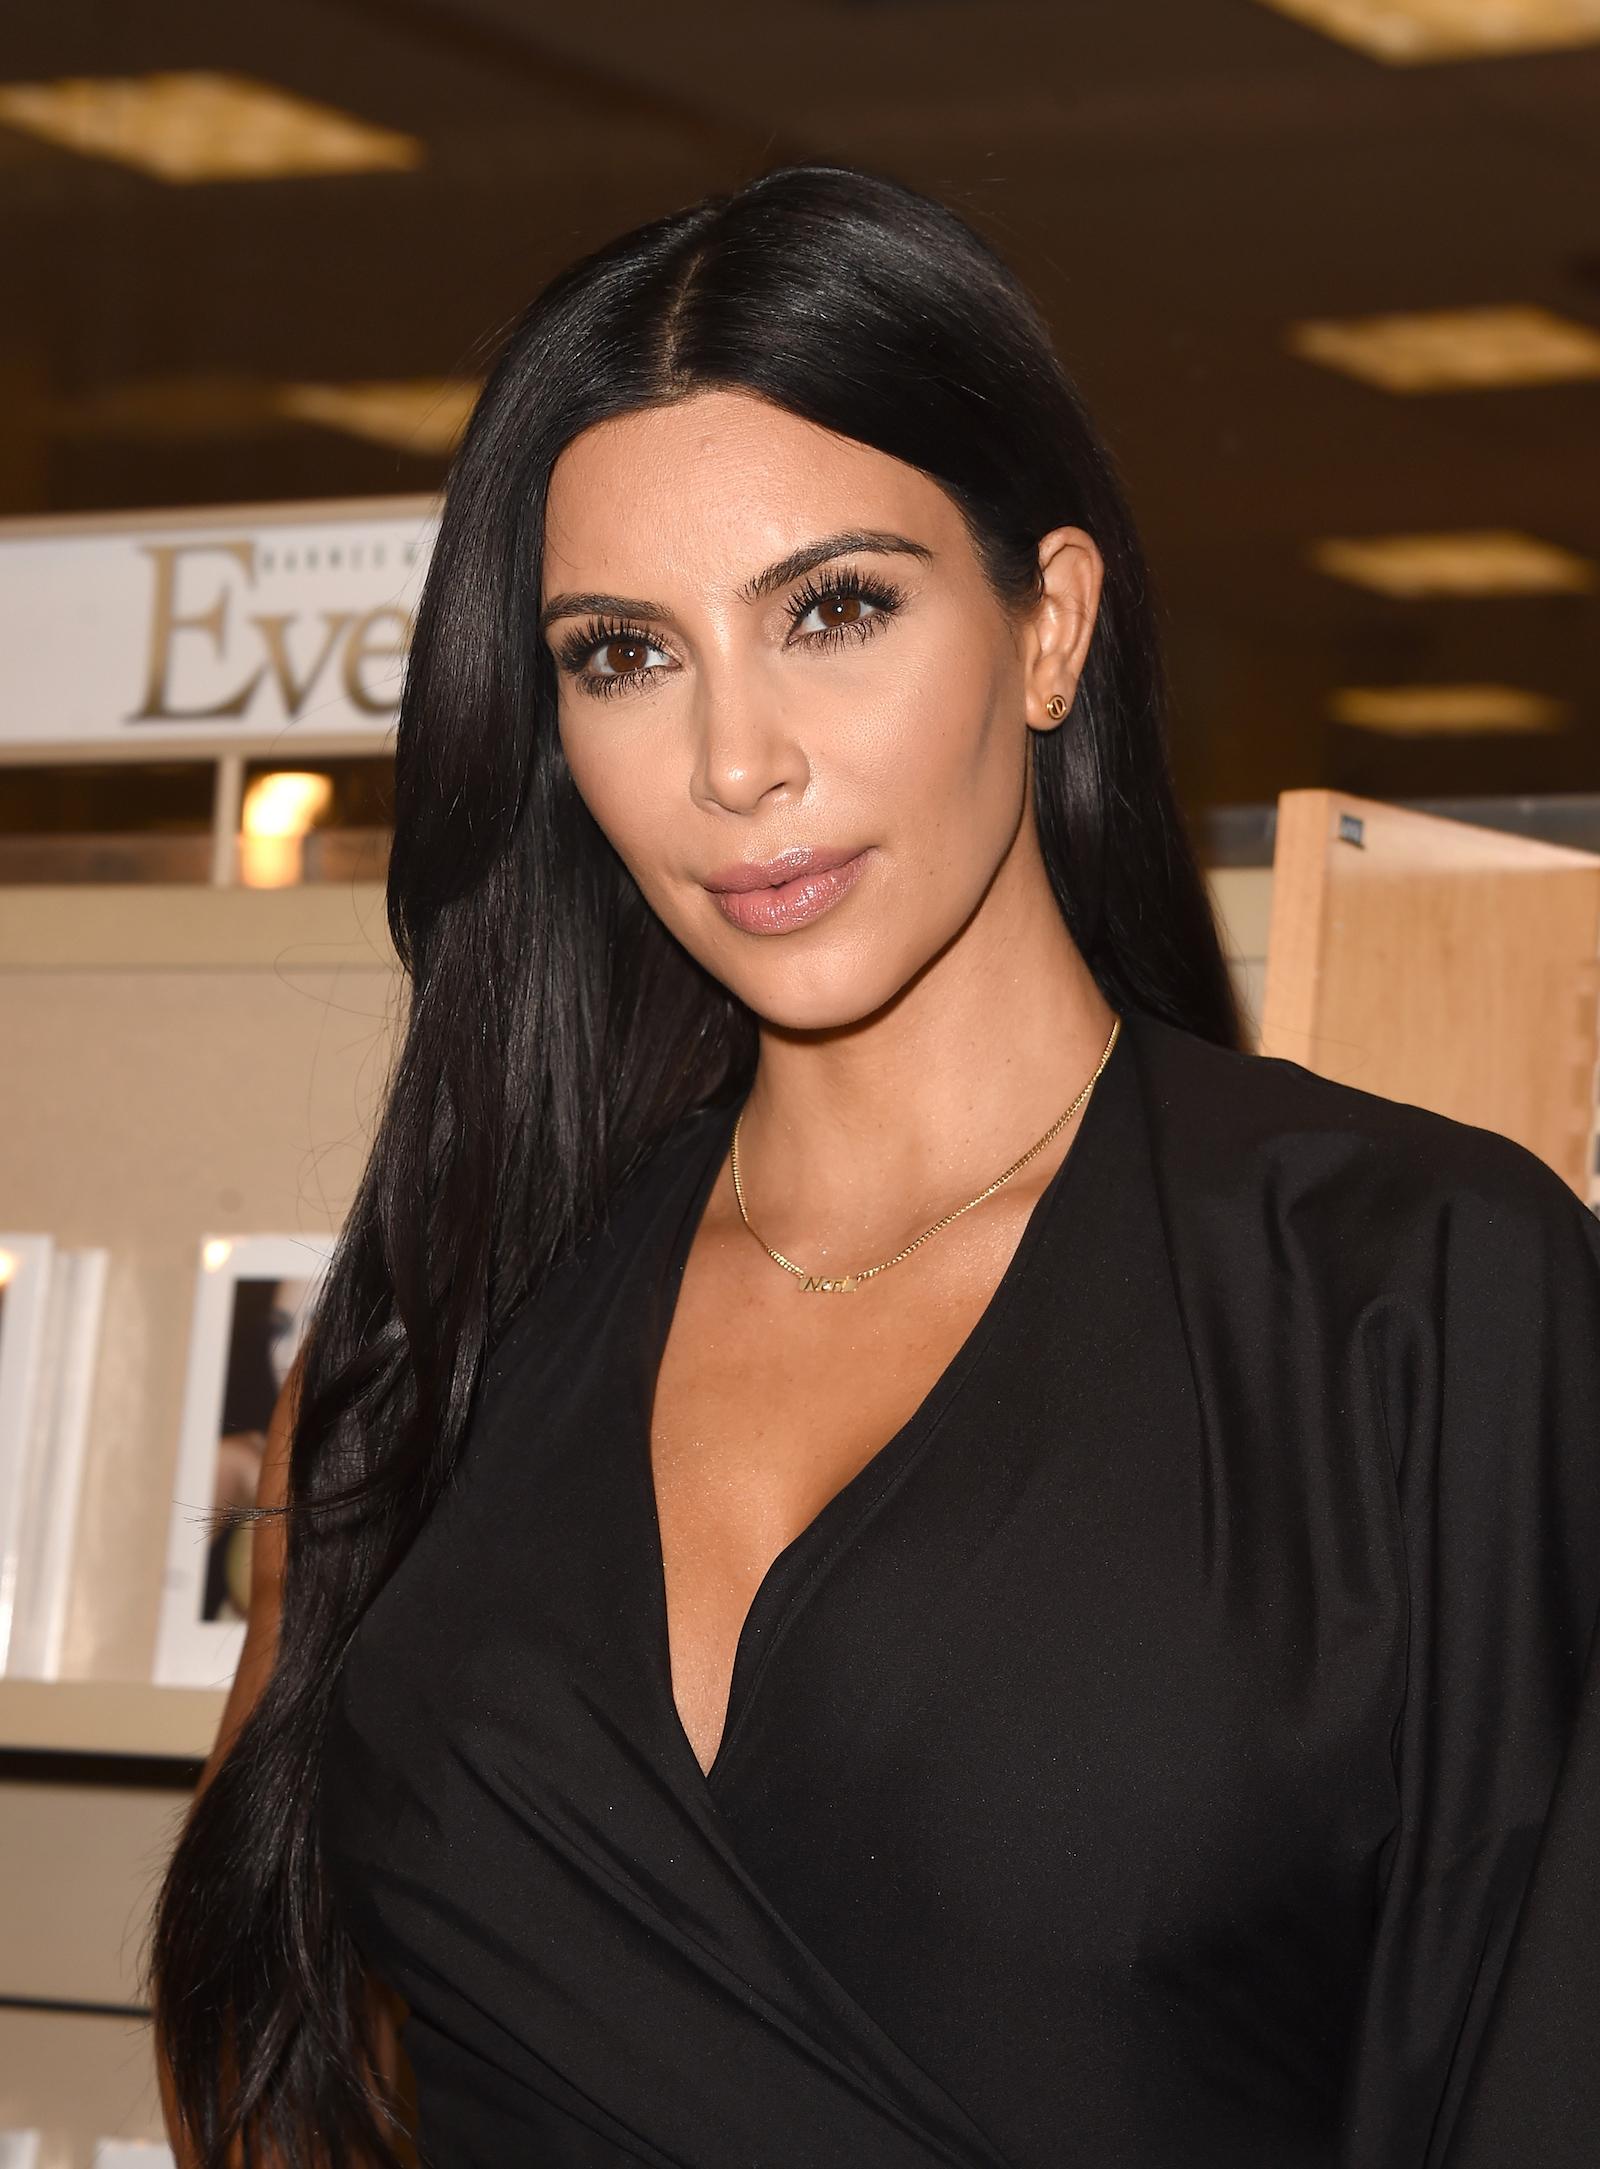 Crown King Az >> 8 Nude Celebrity Selfies Inspired by Kim Kardashian (PHOTOS)